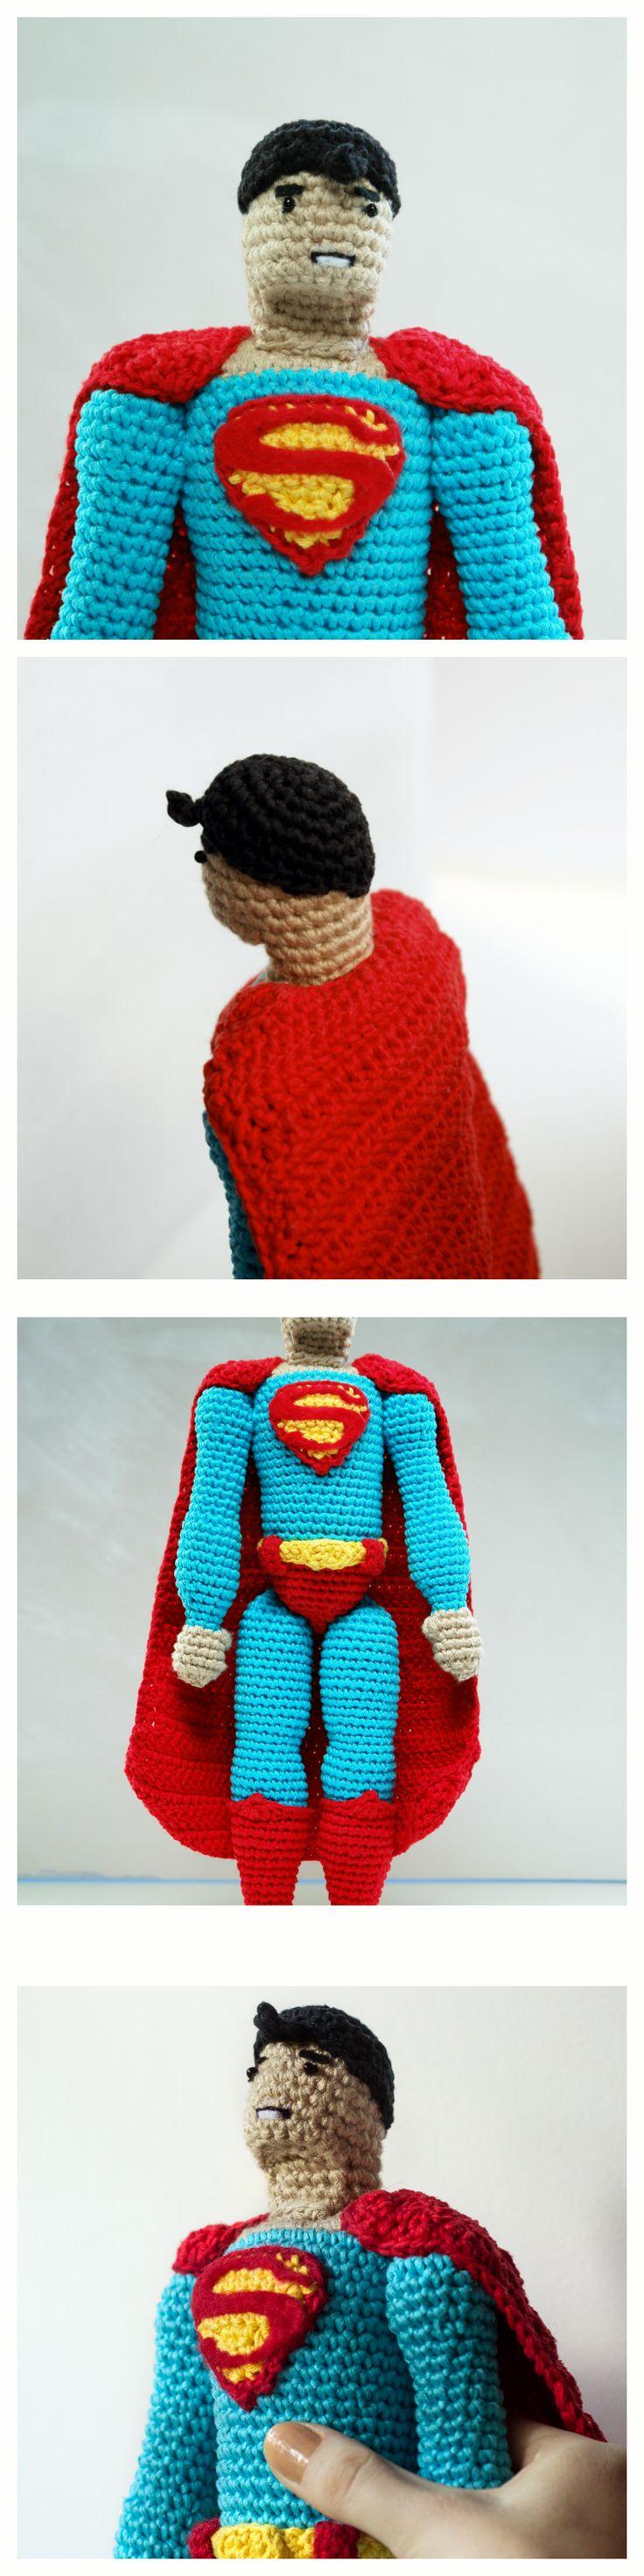 Knitting Pattern Superman Doll : 25+ best ideas about Superman crochet on Pinterest Superman superman, Super...